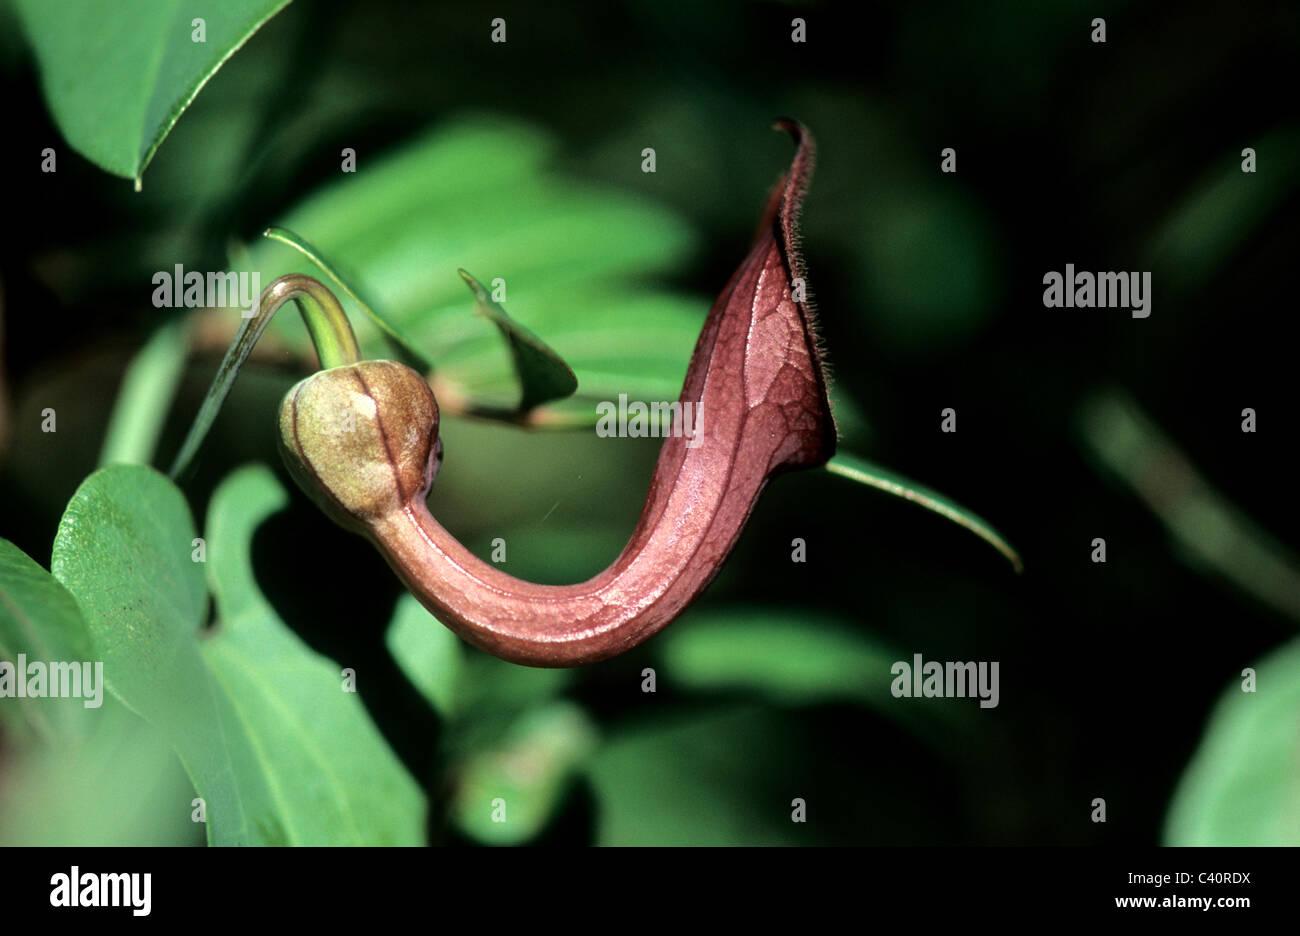 Tình yêu cây cỏ ĐV2 - Page 4 Dutchmans-pipe-aristolochia-fontanesii-aristolochiaceae-flower-detail-C40RDX